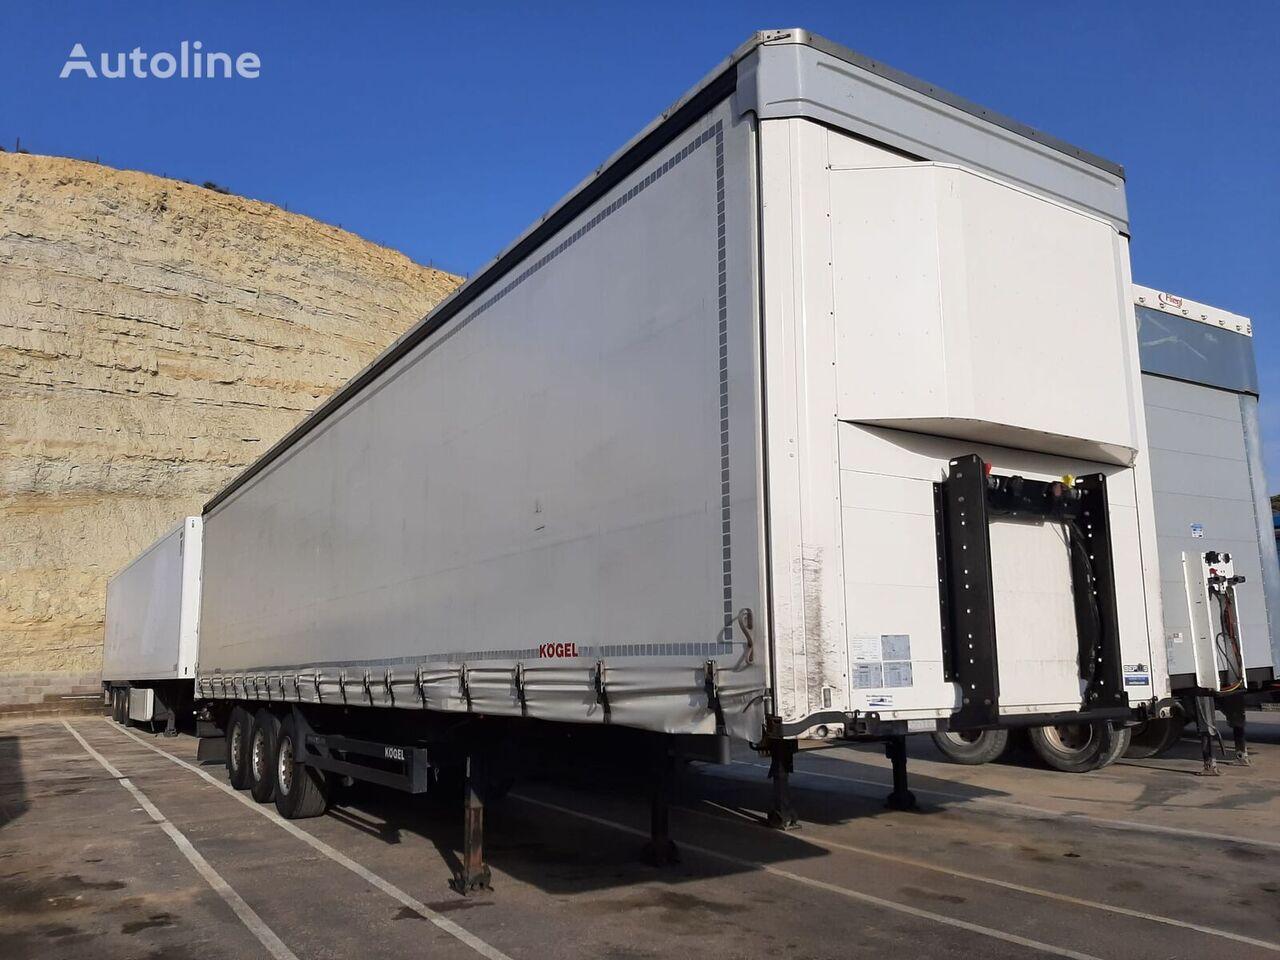 KÖGEL S24-1. SEMIRREMOLQUE TAUTLINER curtain side semi-trailer